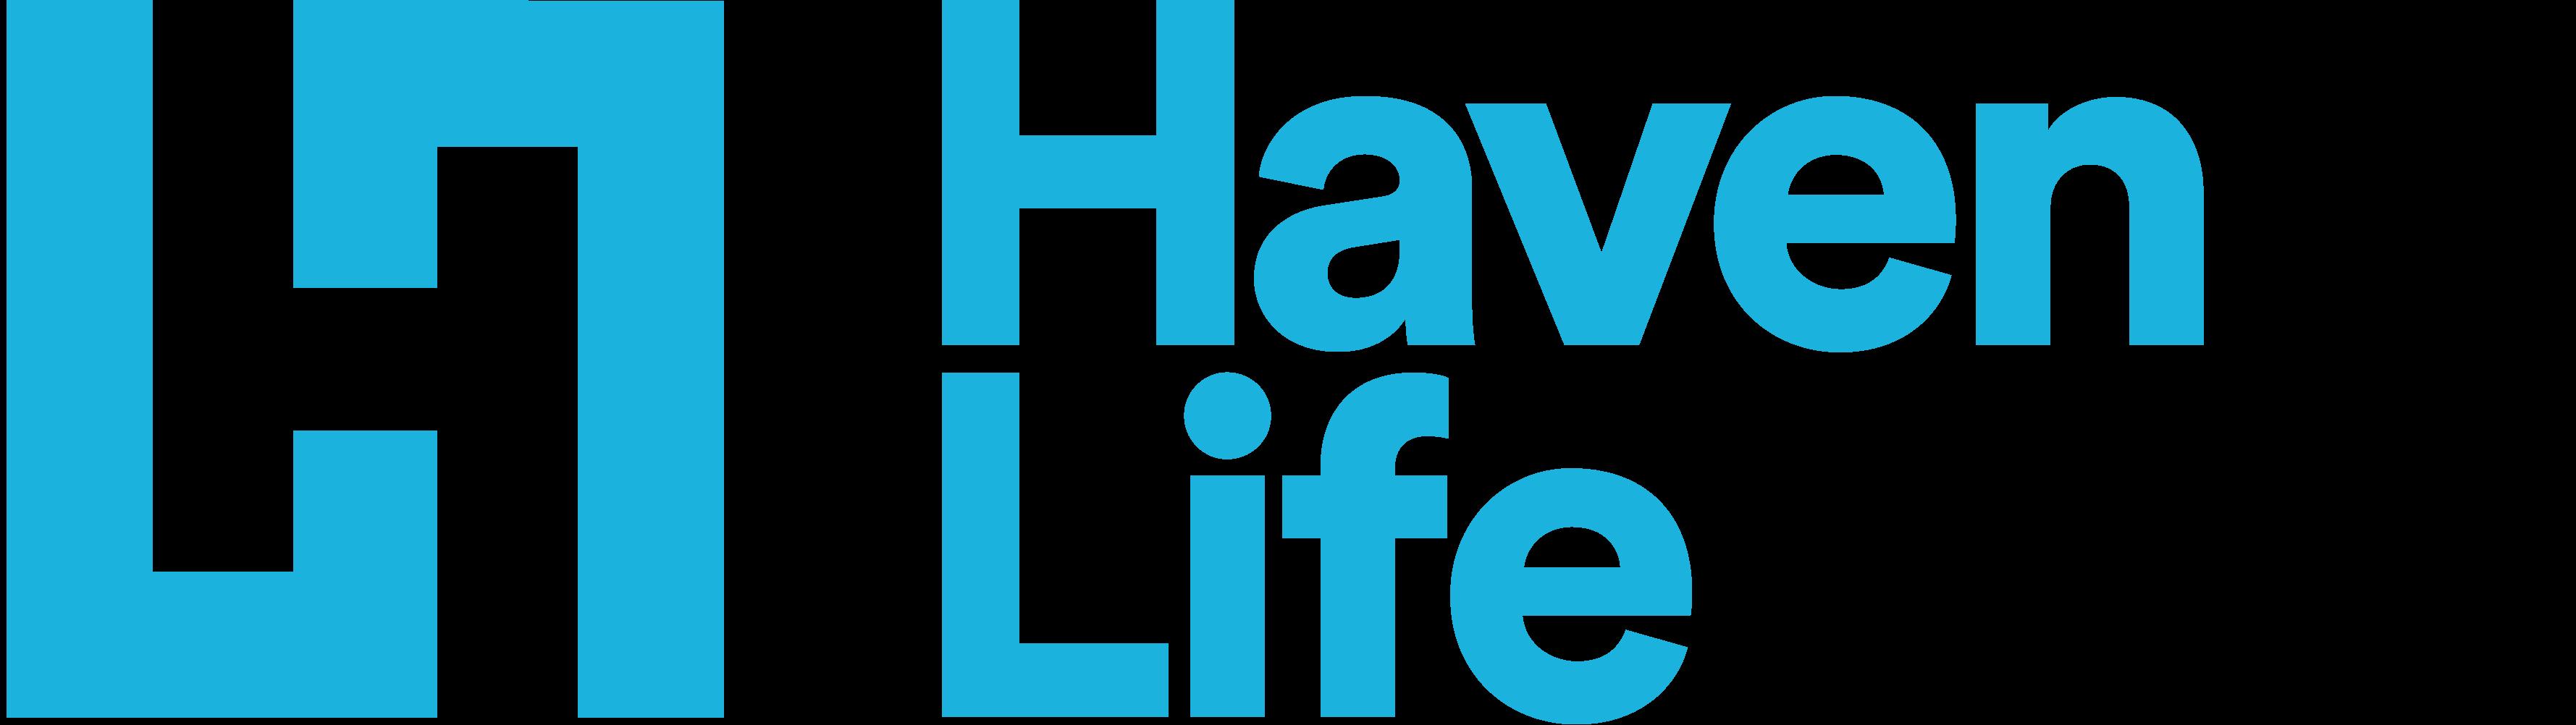 haven-life-logo.53c48058